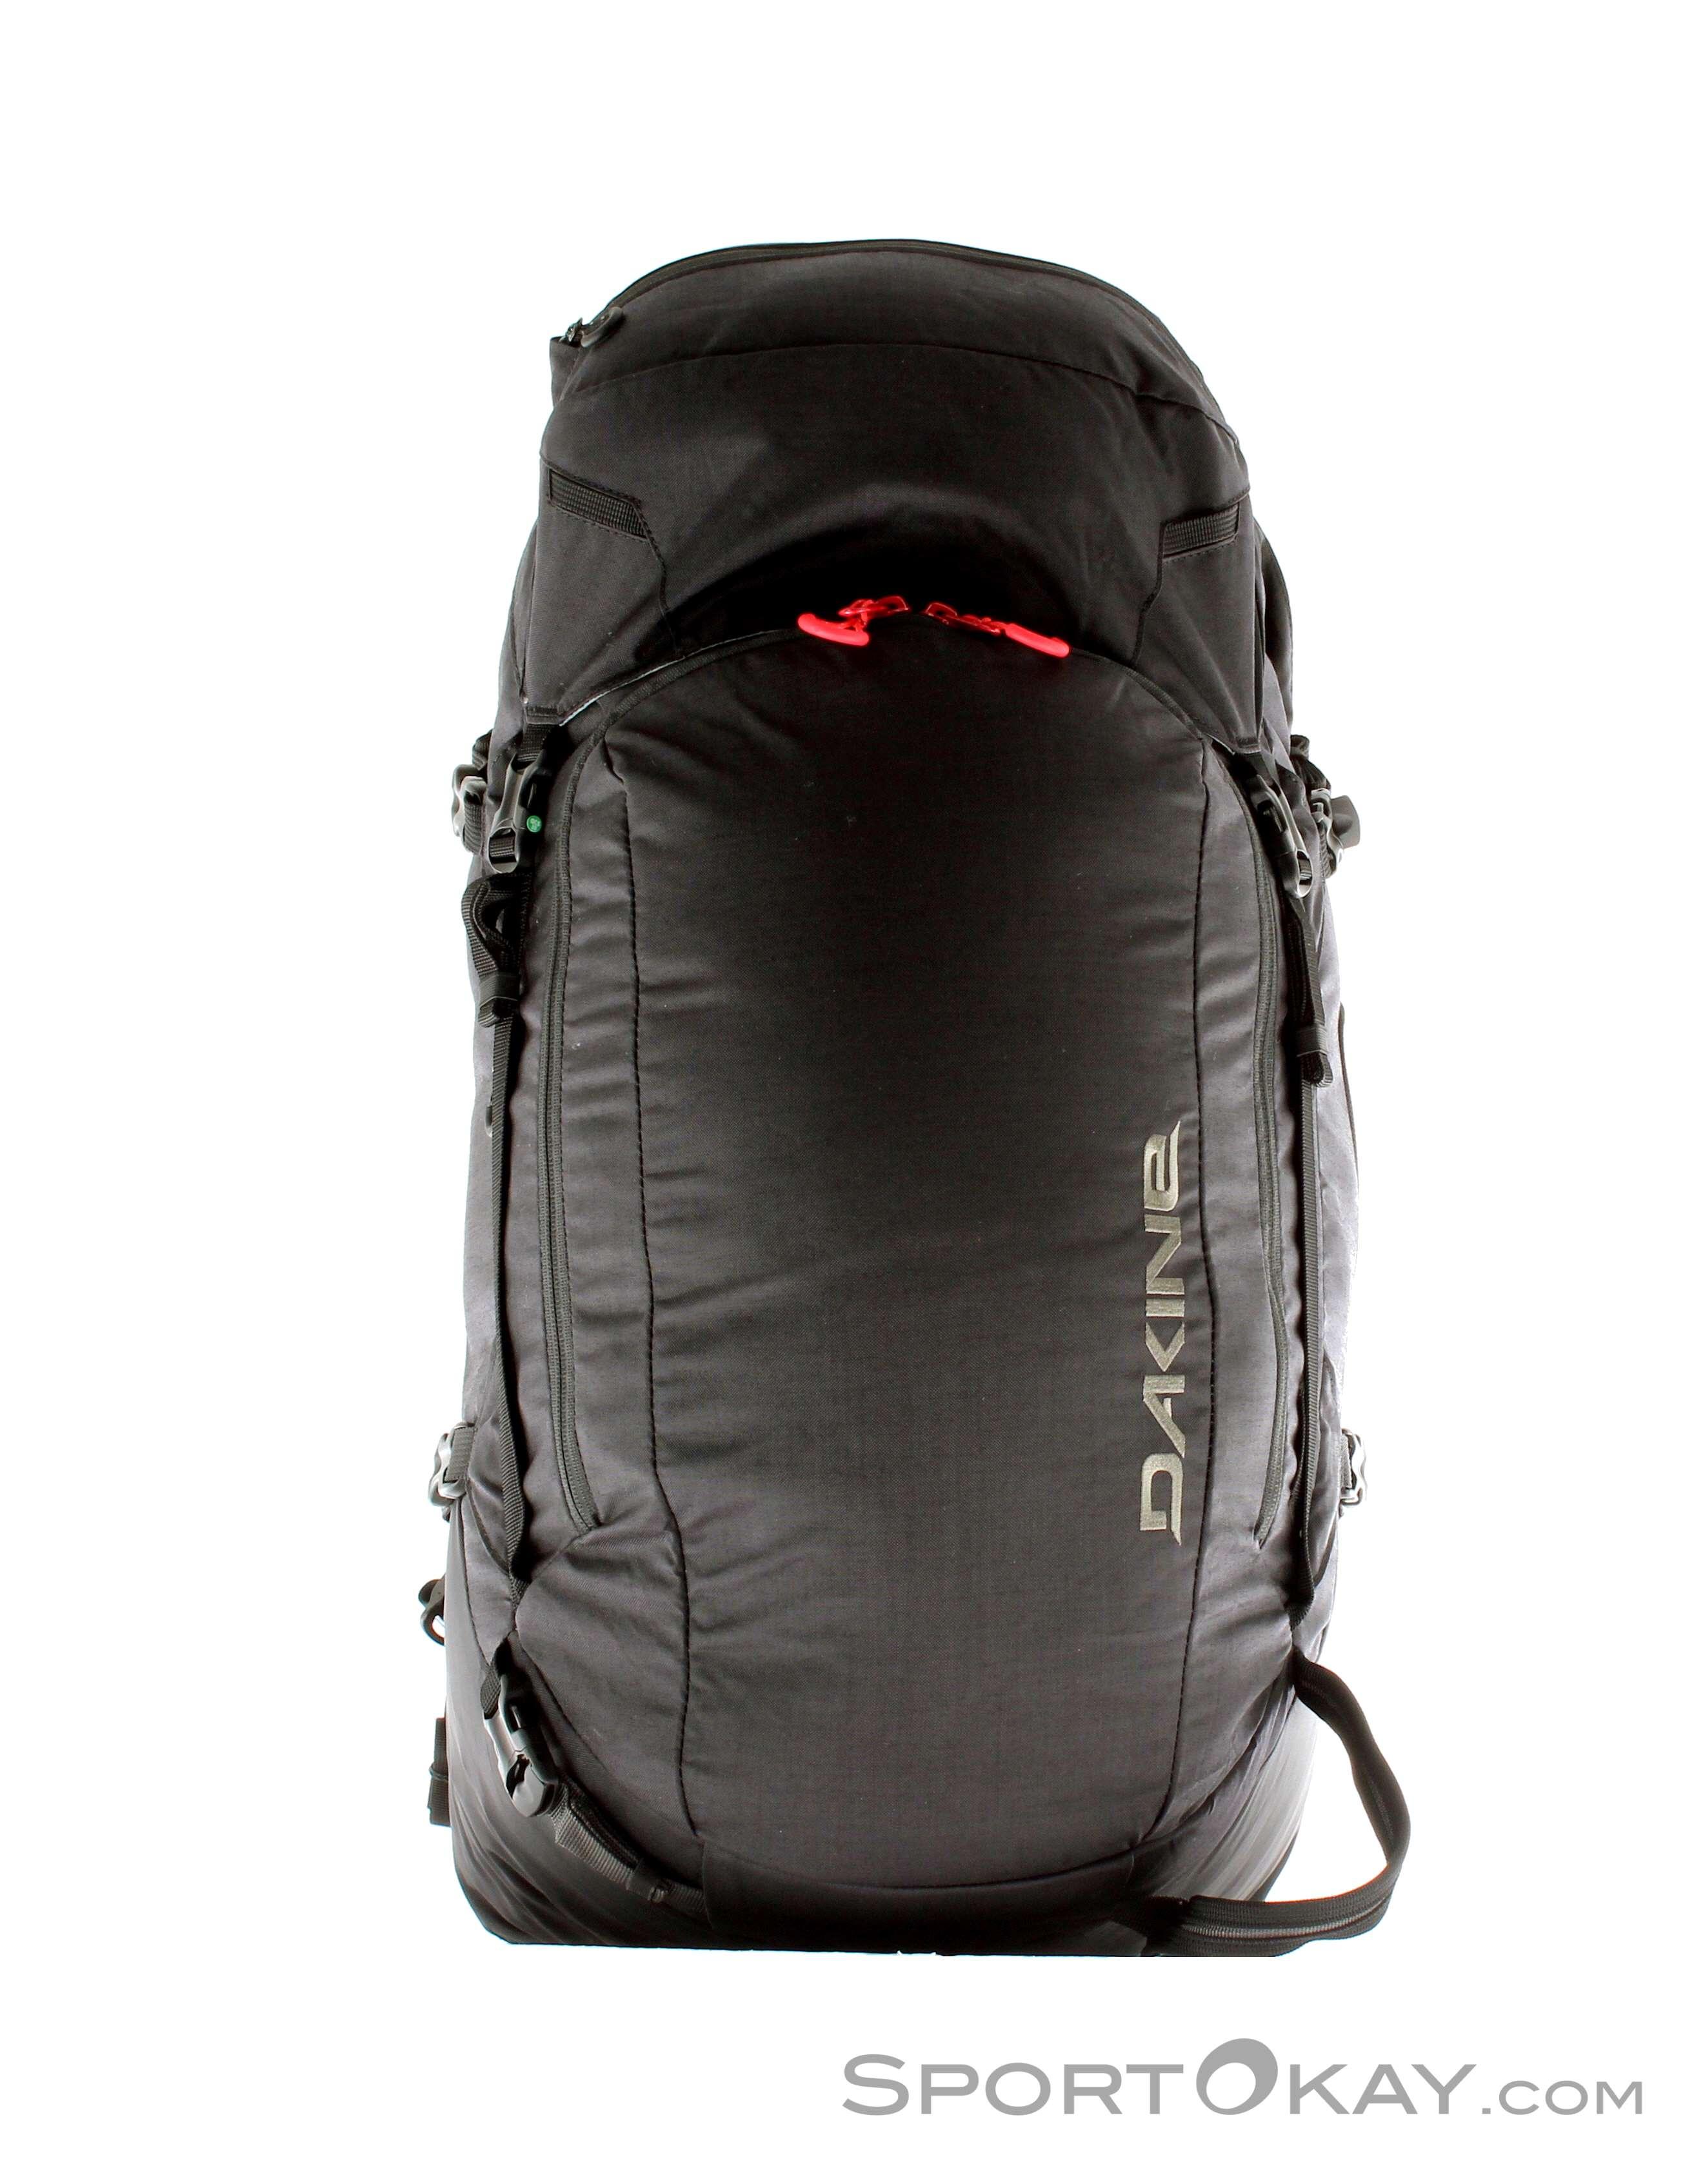 Dakine Poacher RAS 46l Airbag Backpack - Backpacks - Safety - Ski ...